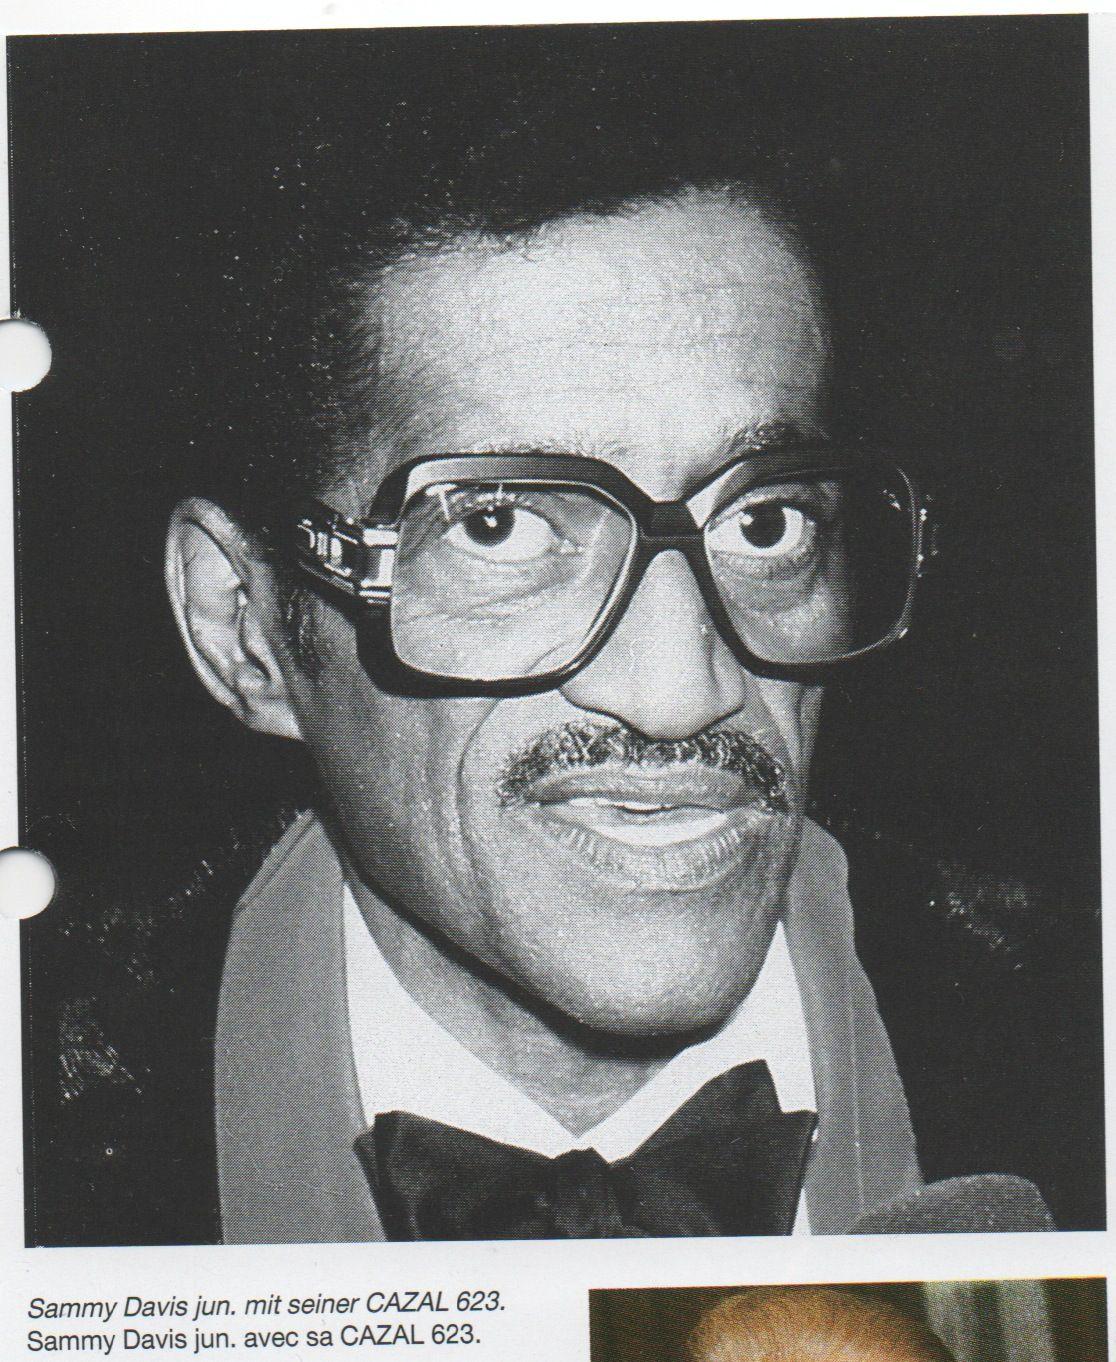 356149c00a Sammy Davis Jr in Cazal 623 Sammy Davis Jr